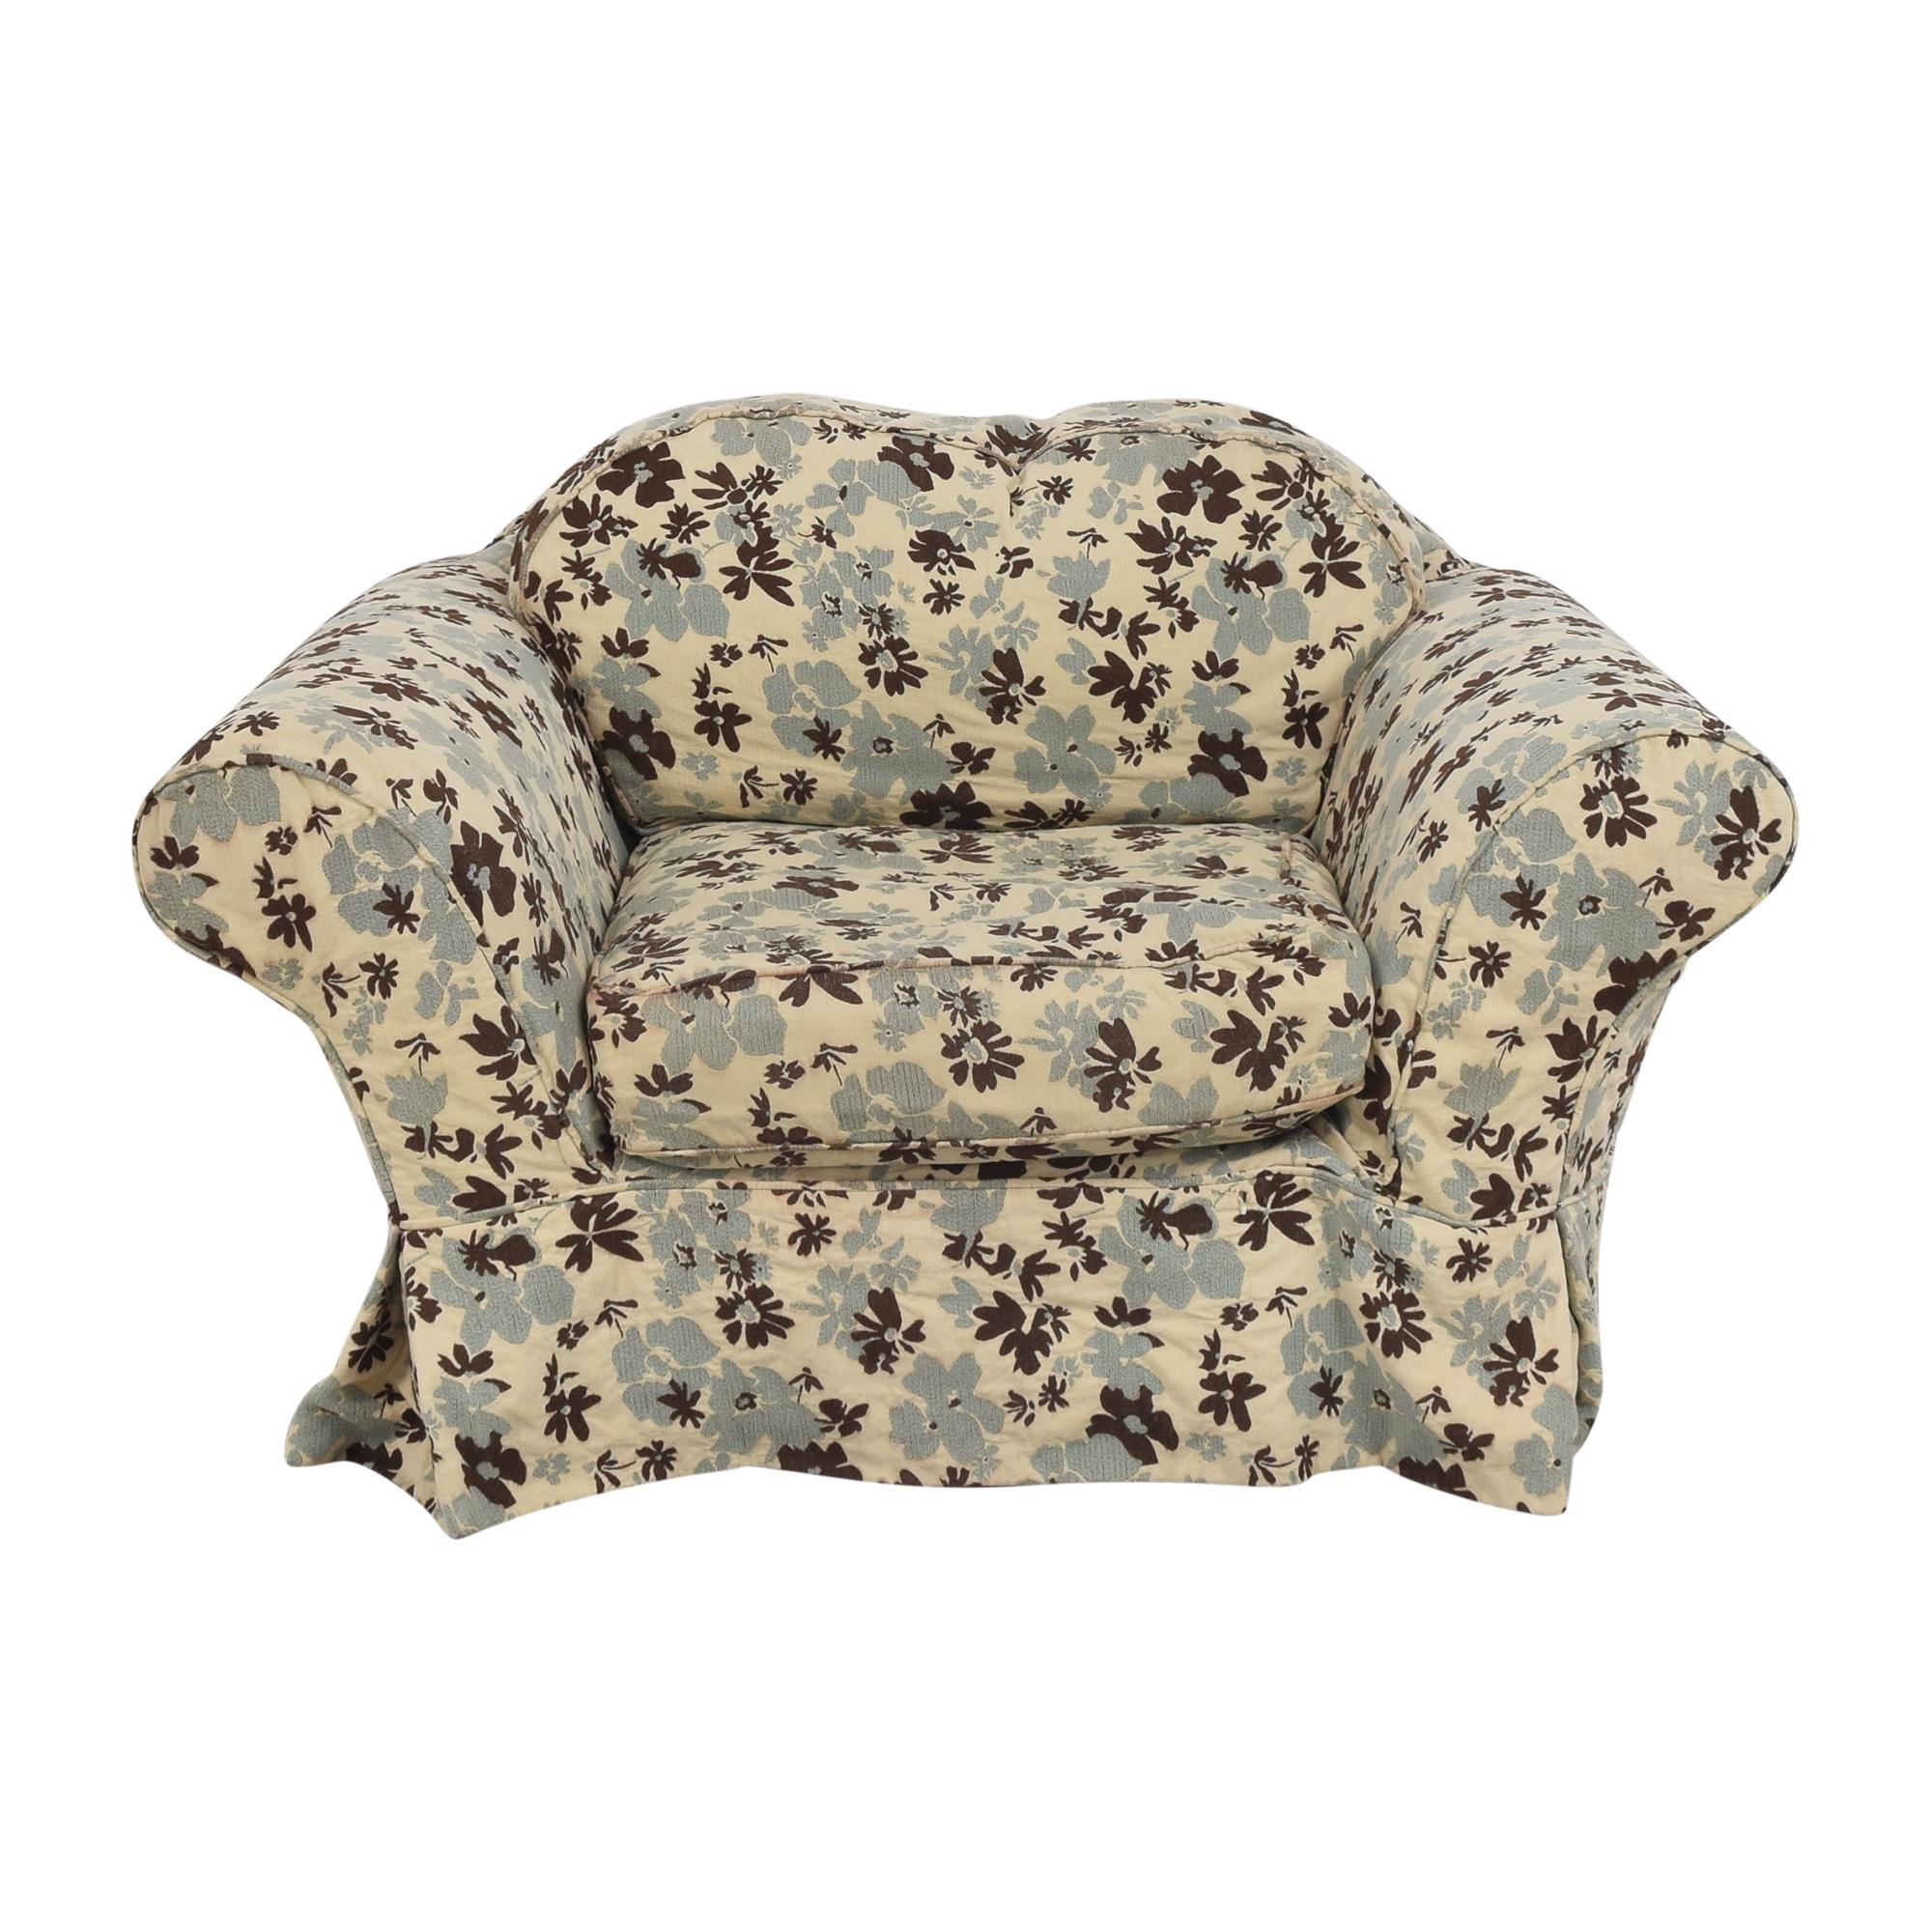 Quatrine Quatrine Slipcovered Accent Chair second hand